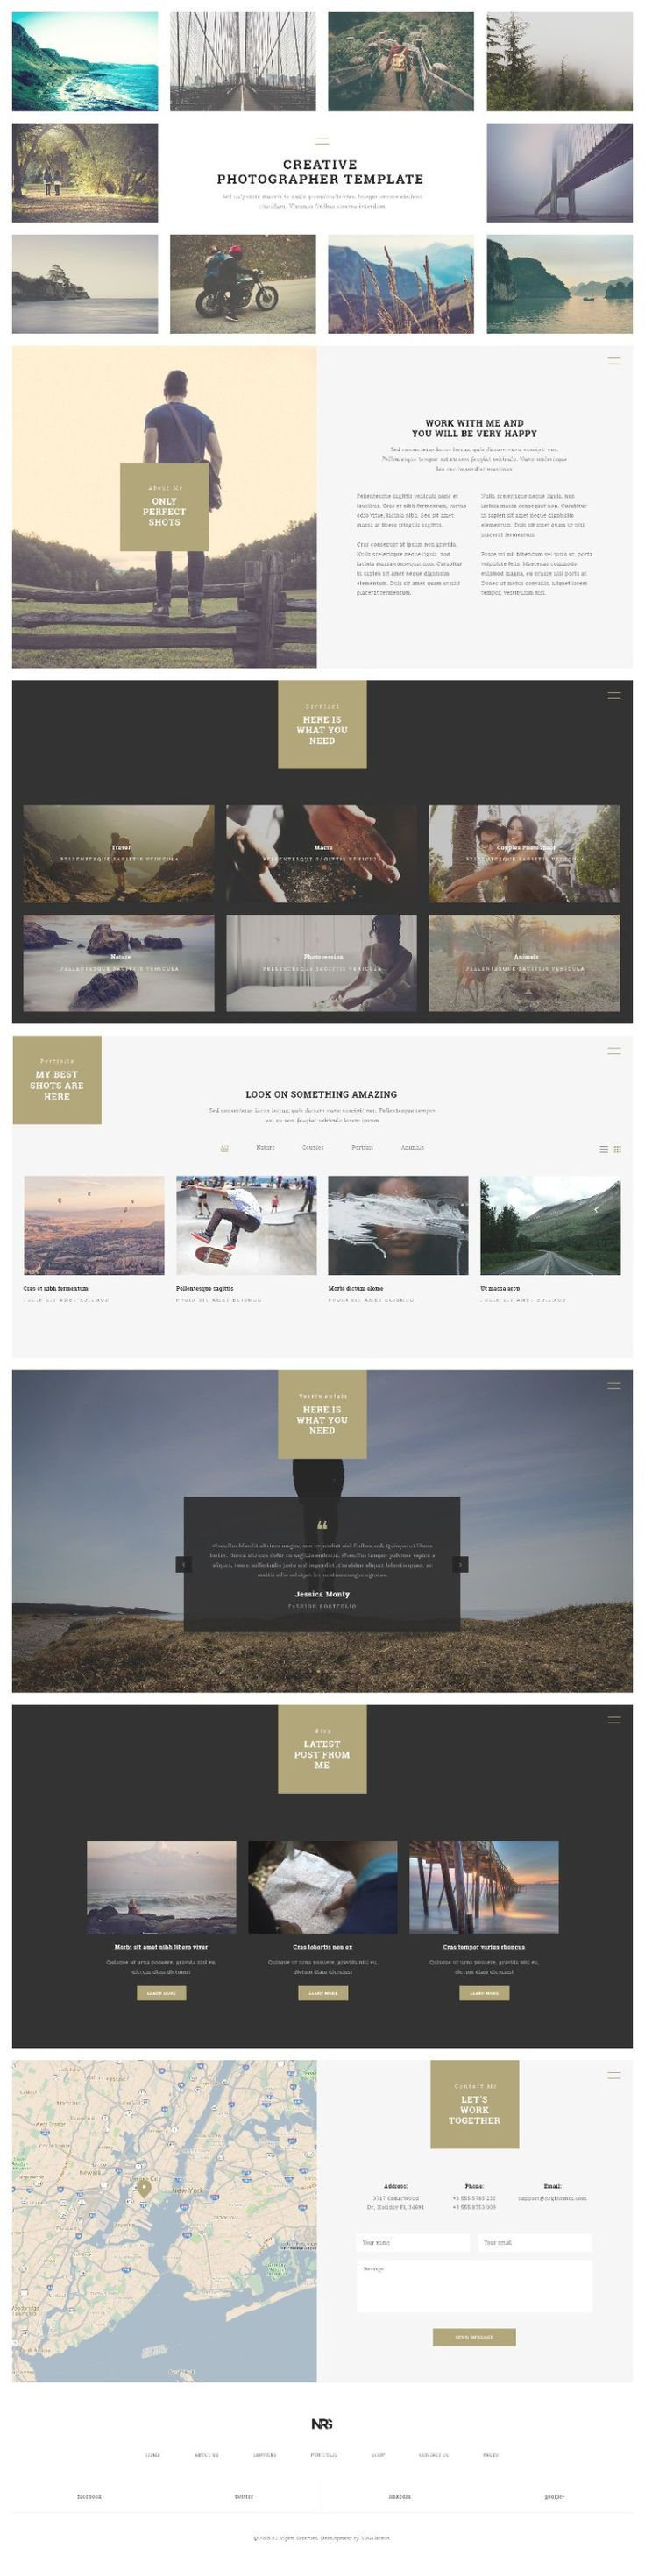 Web Design Inspiration from NRG part 2 1